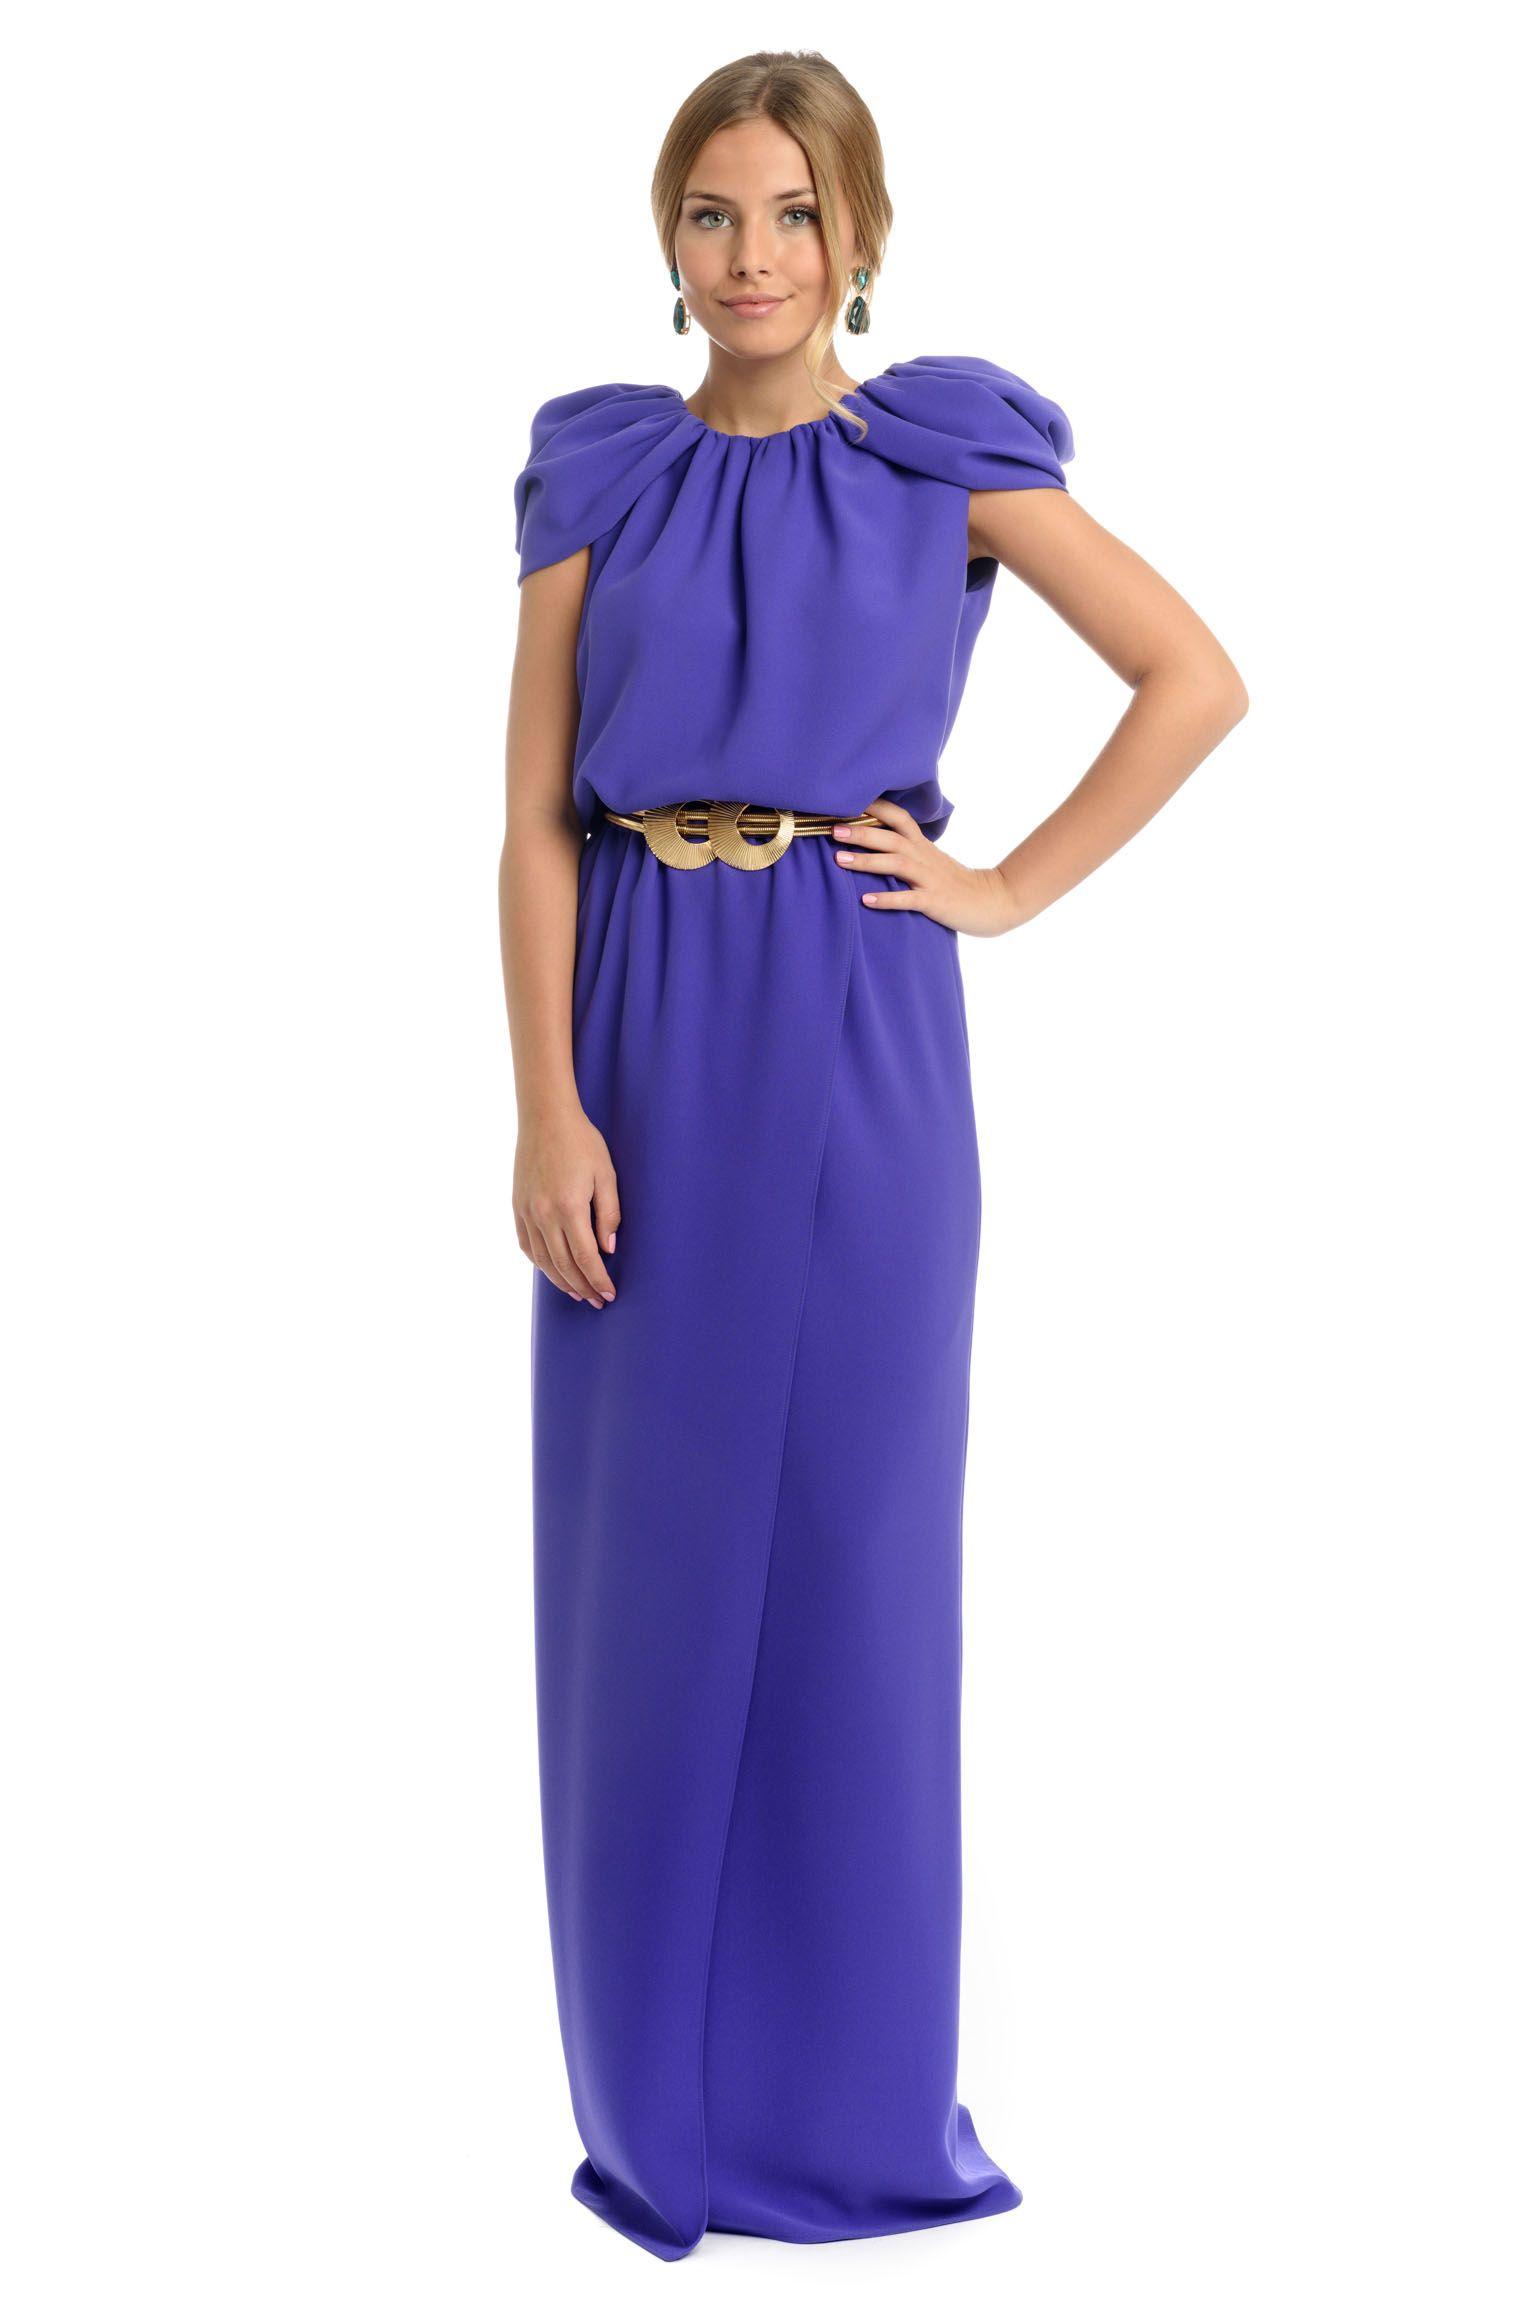 Vestido Corina largo petunia | Madrina | Pinterest | Nuevas